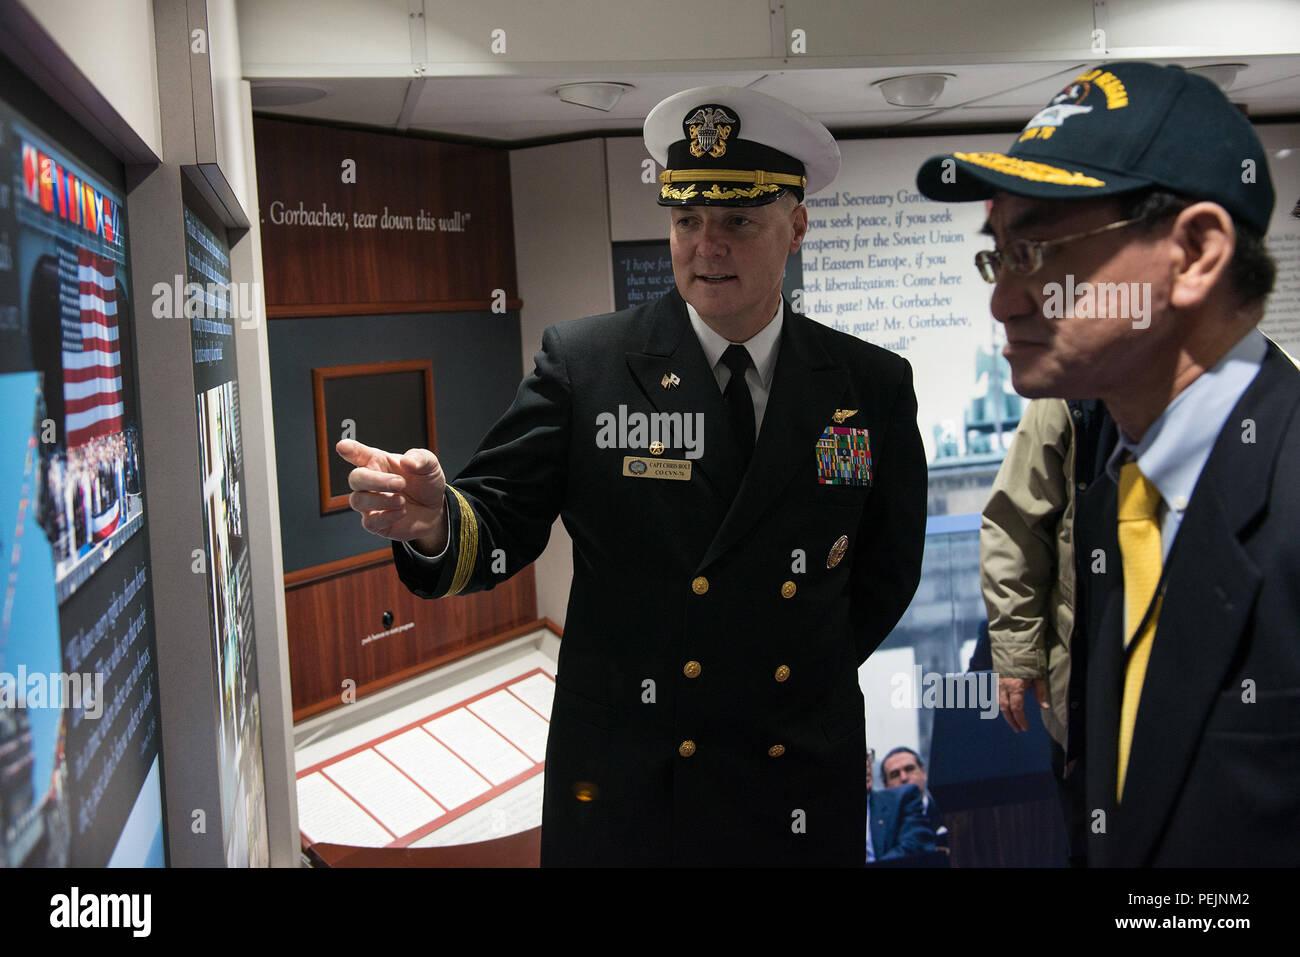 151209 N Wa993 119 Yokosuka Japan Dec 9 2015 The Commanding Taro Navy Officer Of Us Navys Only Forward Deployed Aircraft Carrier Uss Ronald Reagan Cvn 76 Capt Chris Bolt Left Gives Minister Kono